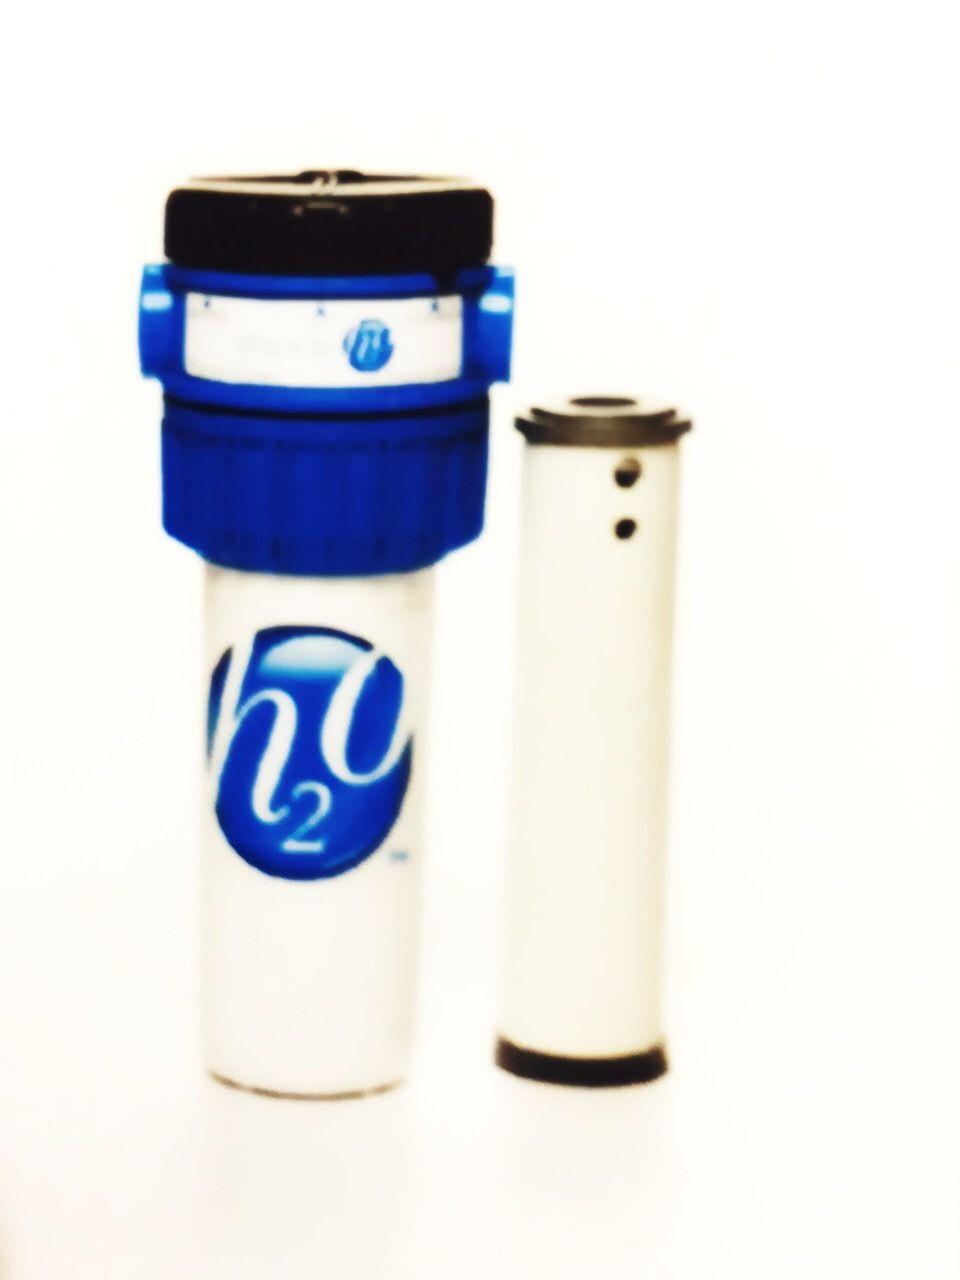 nuvo h2o Salt Free Water Softener Studio System DPSB w/New